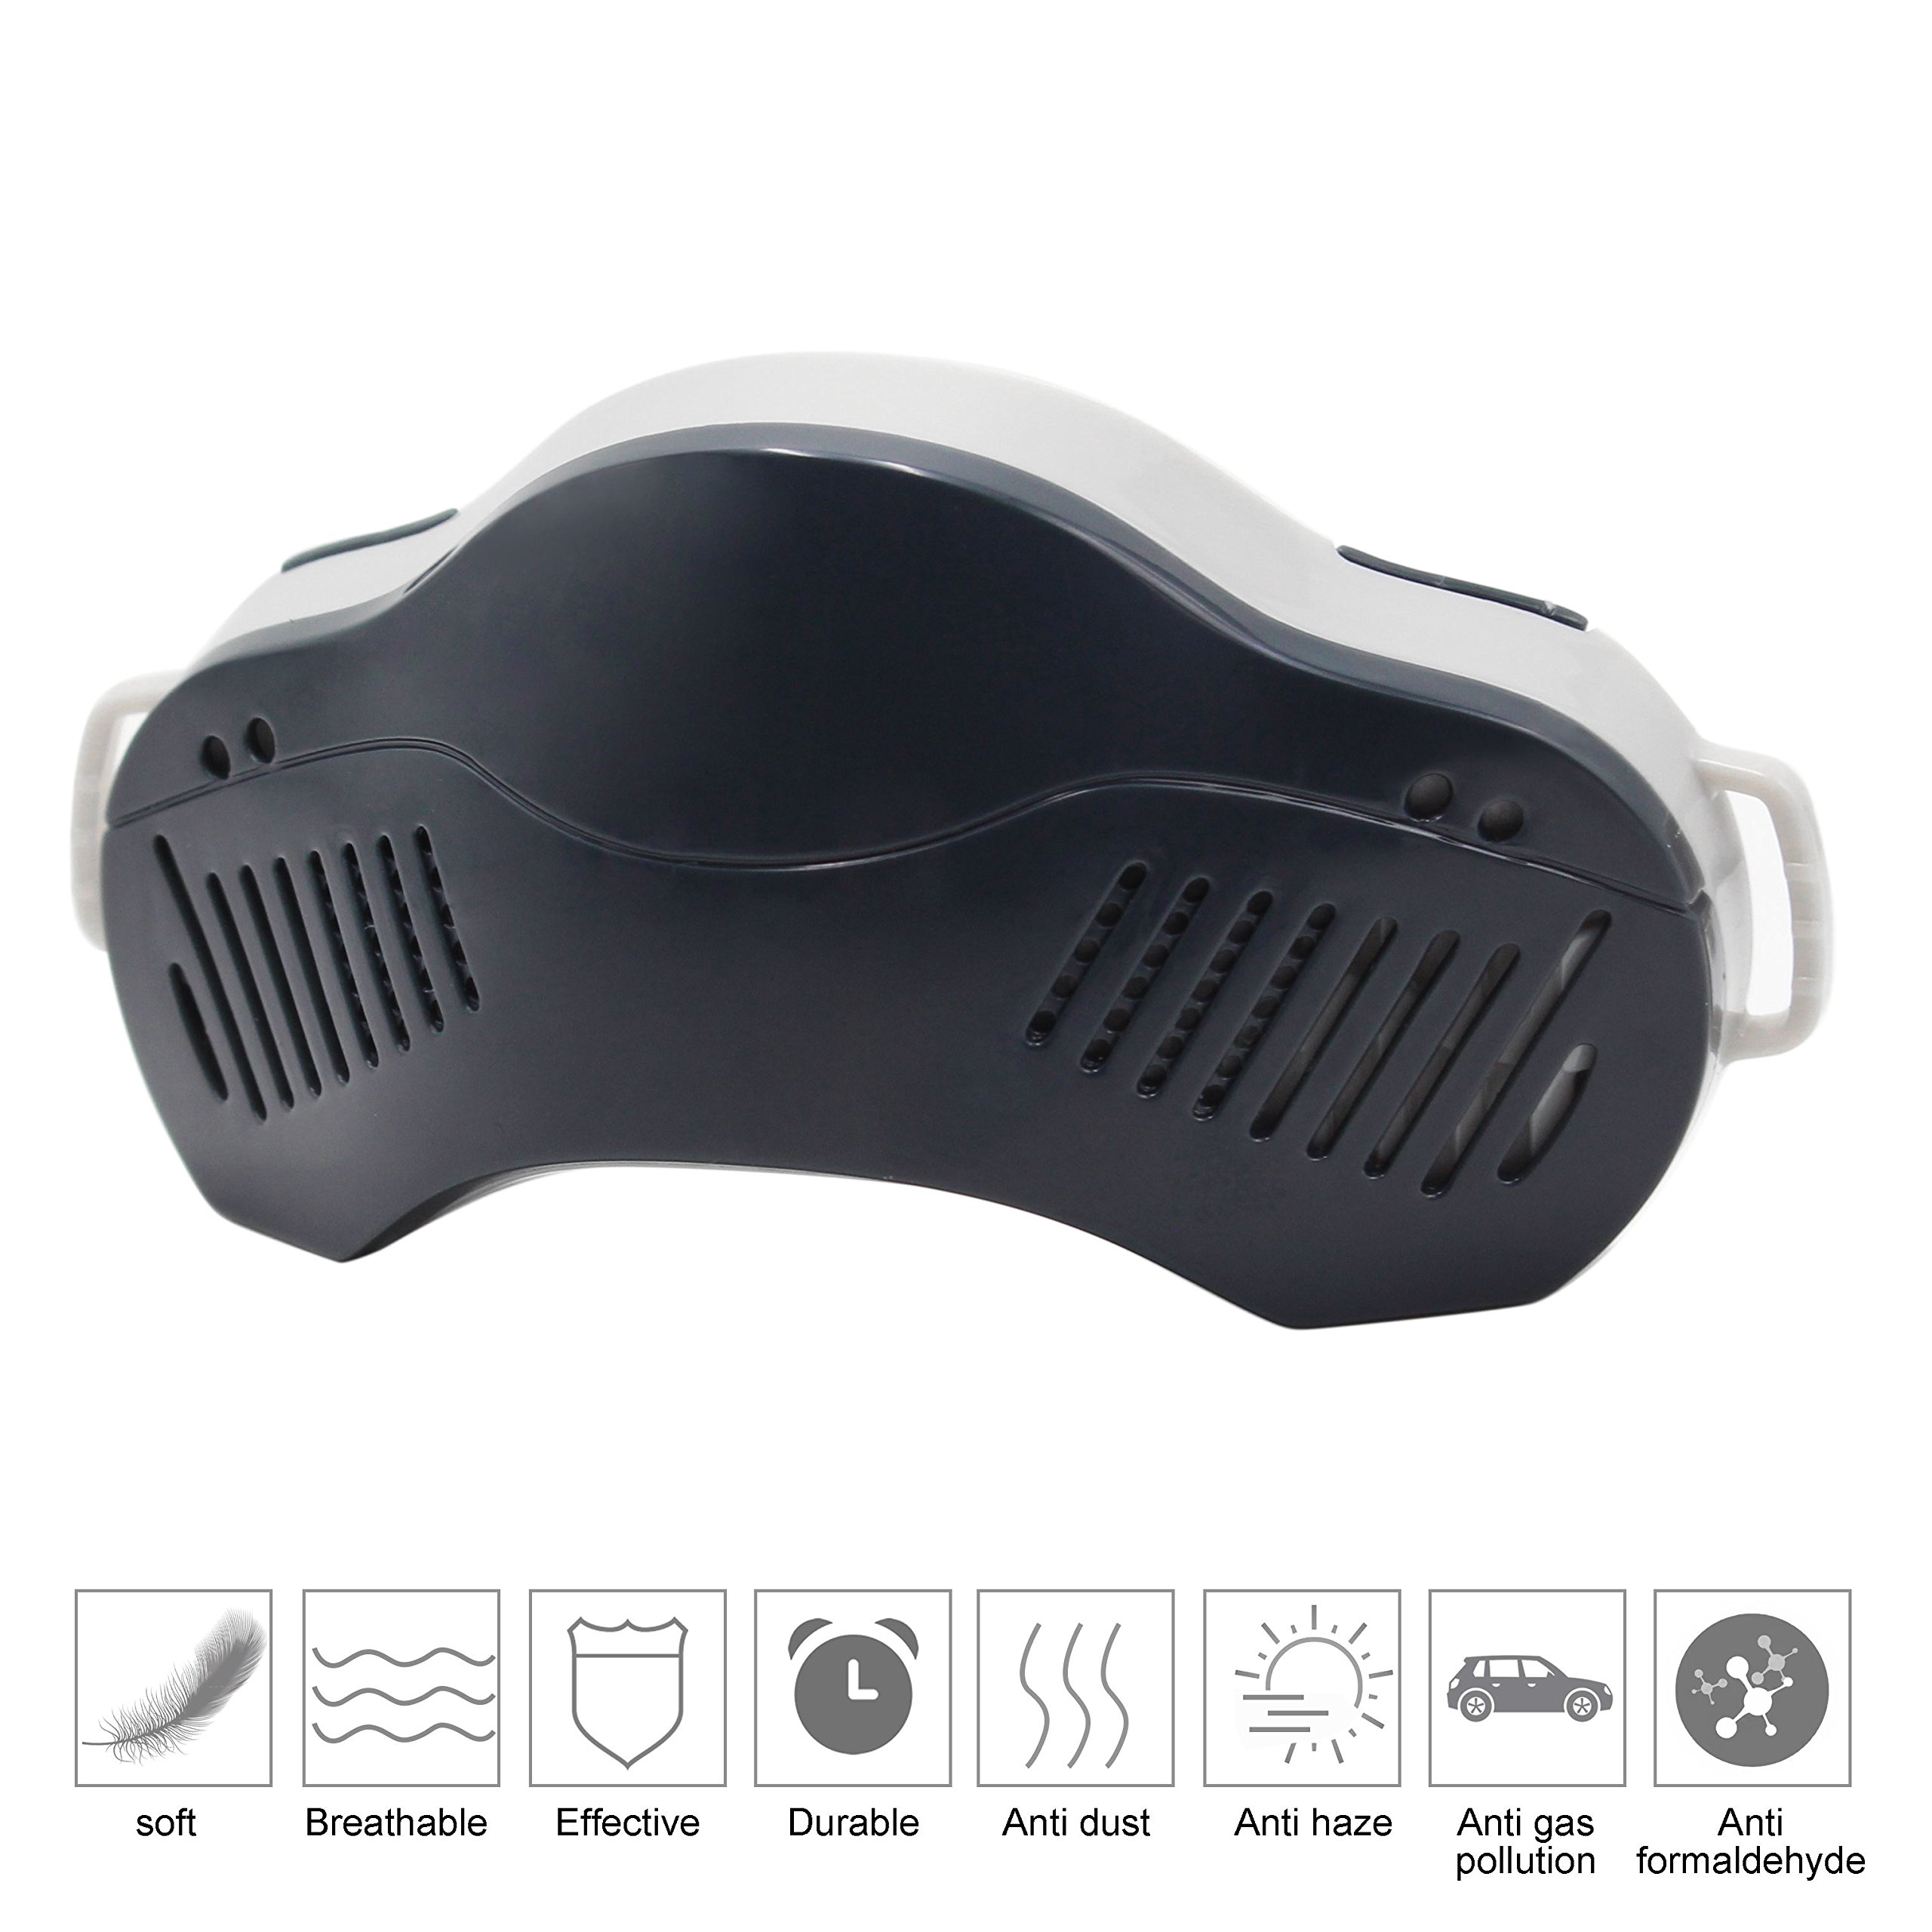 QILOVE Nose Nasal Filter Defense Against Haze, Gas, Pollen, Dust, second-hand smoke, Air Pollution PM2.5 etc (Deep Gray)